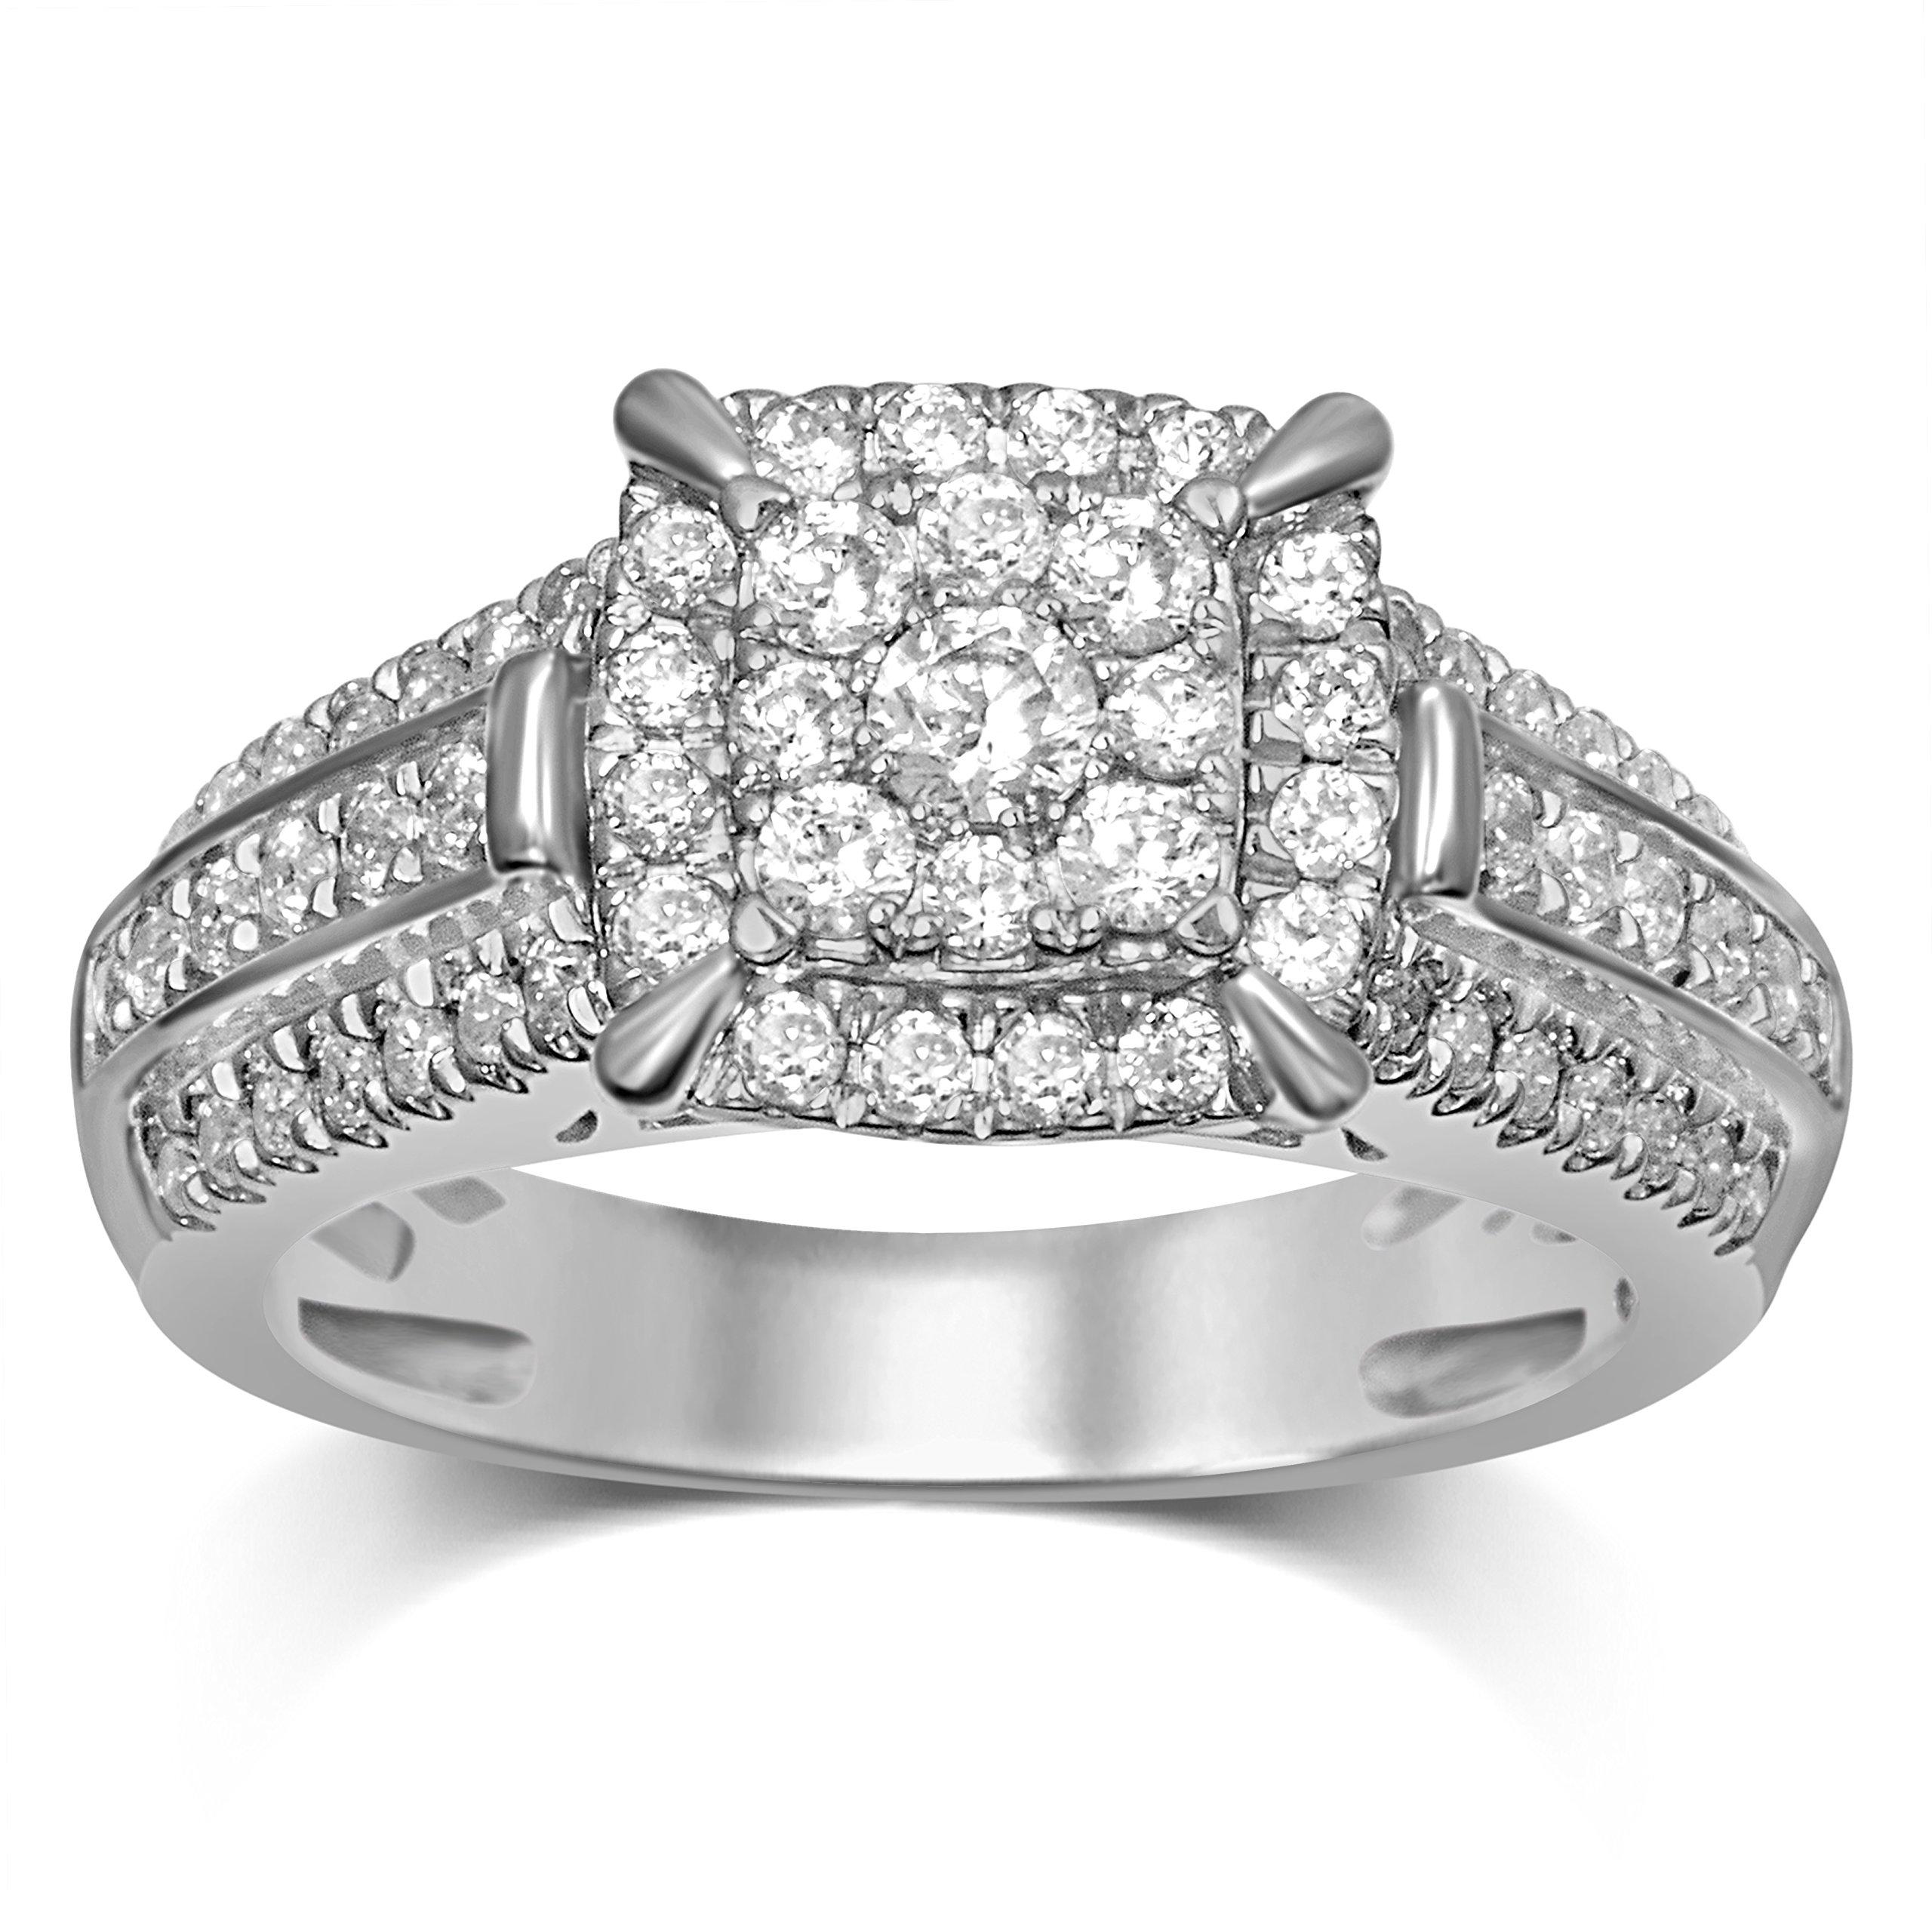 Diamond Jewel 14K White Gold 1 CT TW Diamond Cluster Engagement Ring (H-J, I1)